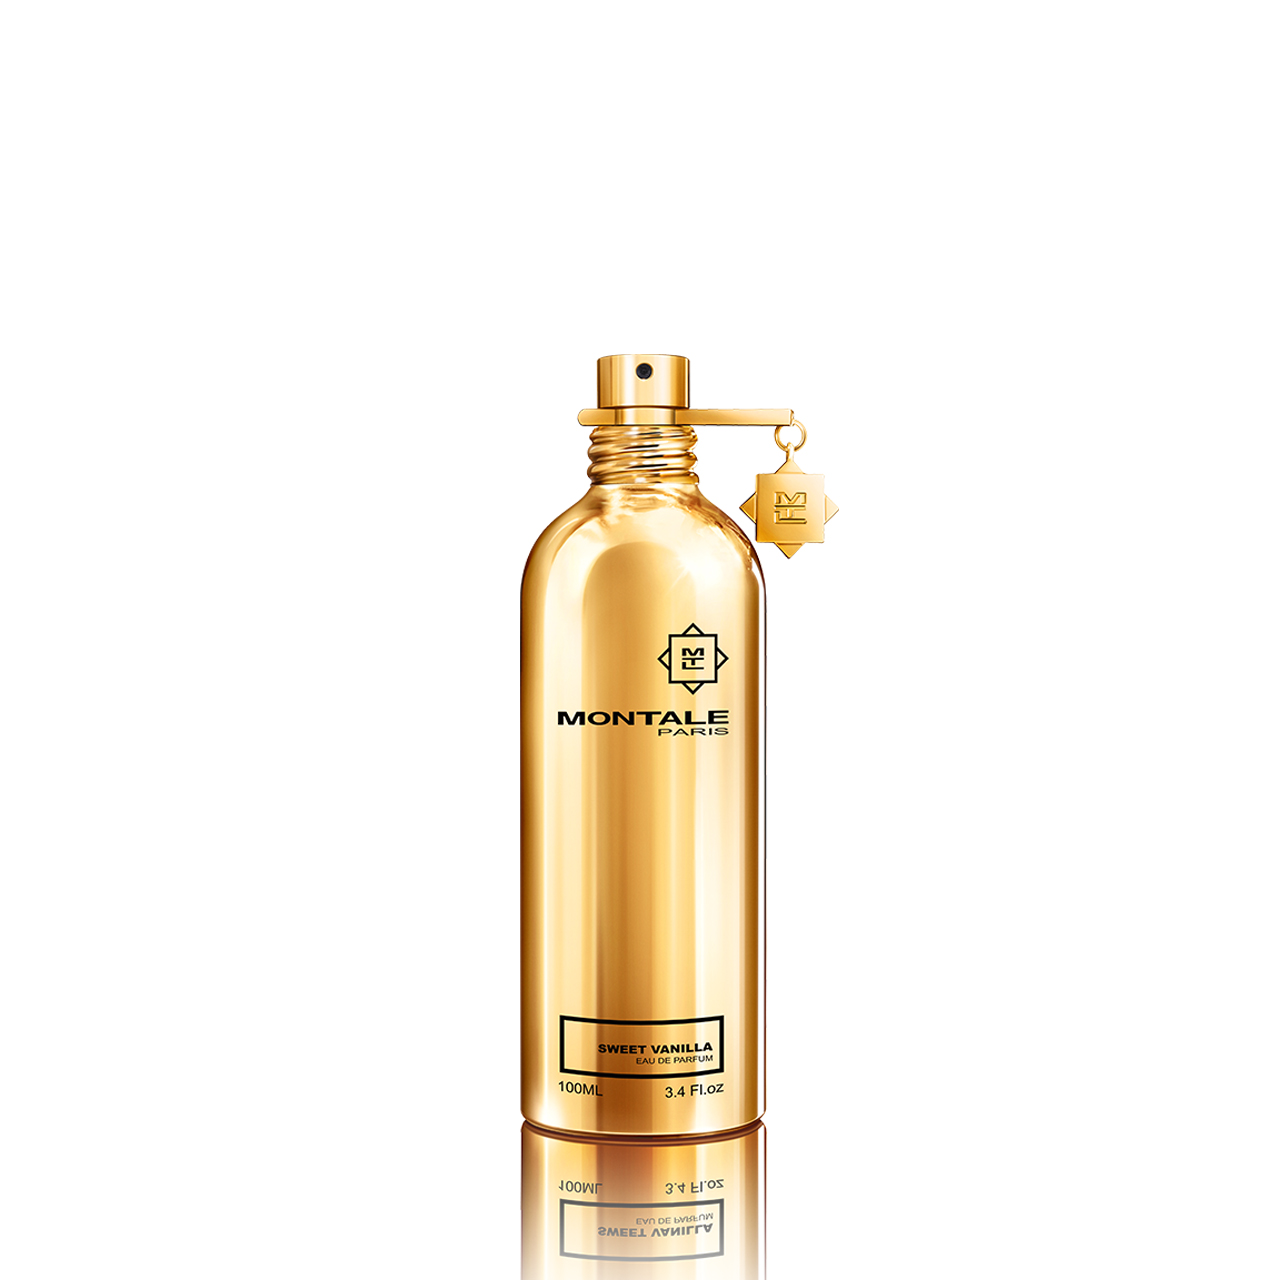 Sweet Vanilla - Eau de Parfum